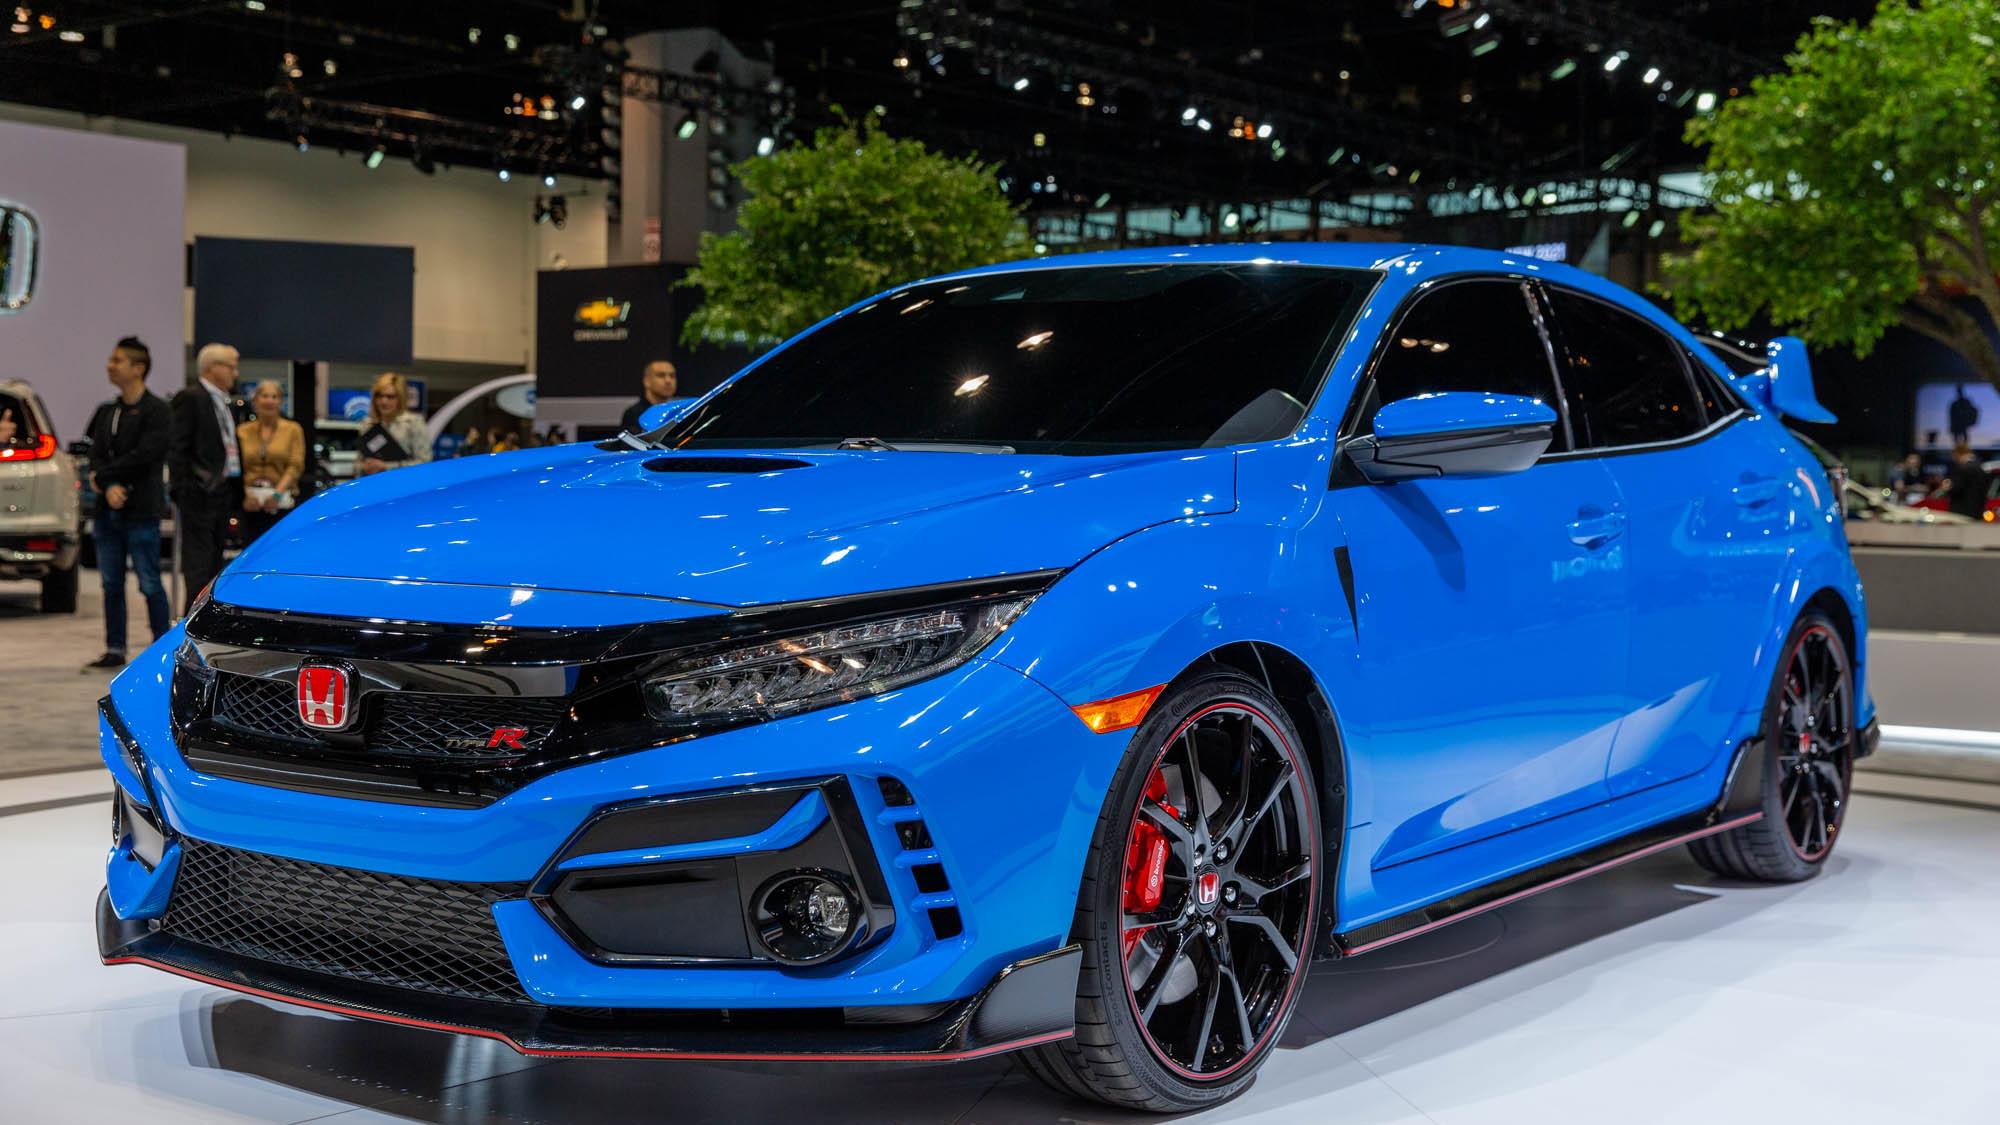 2020 Honda Civic Type R, 2020 Chicago Auto Show